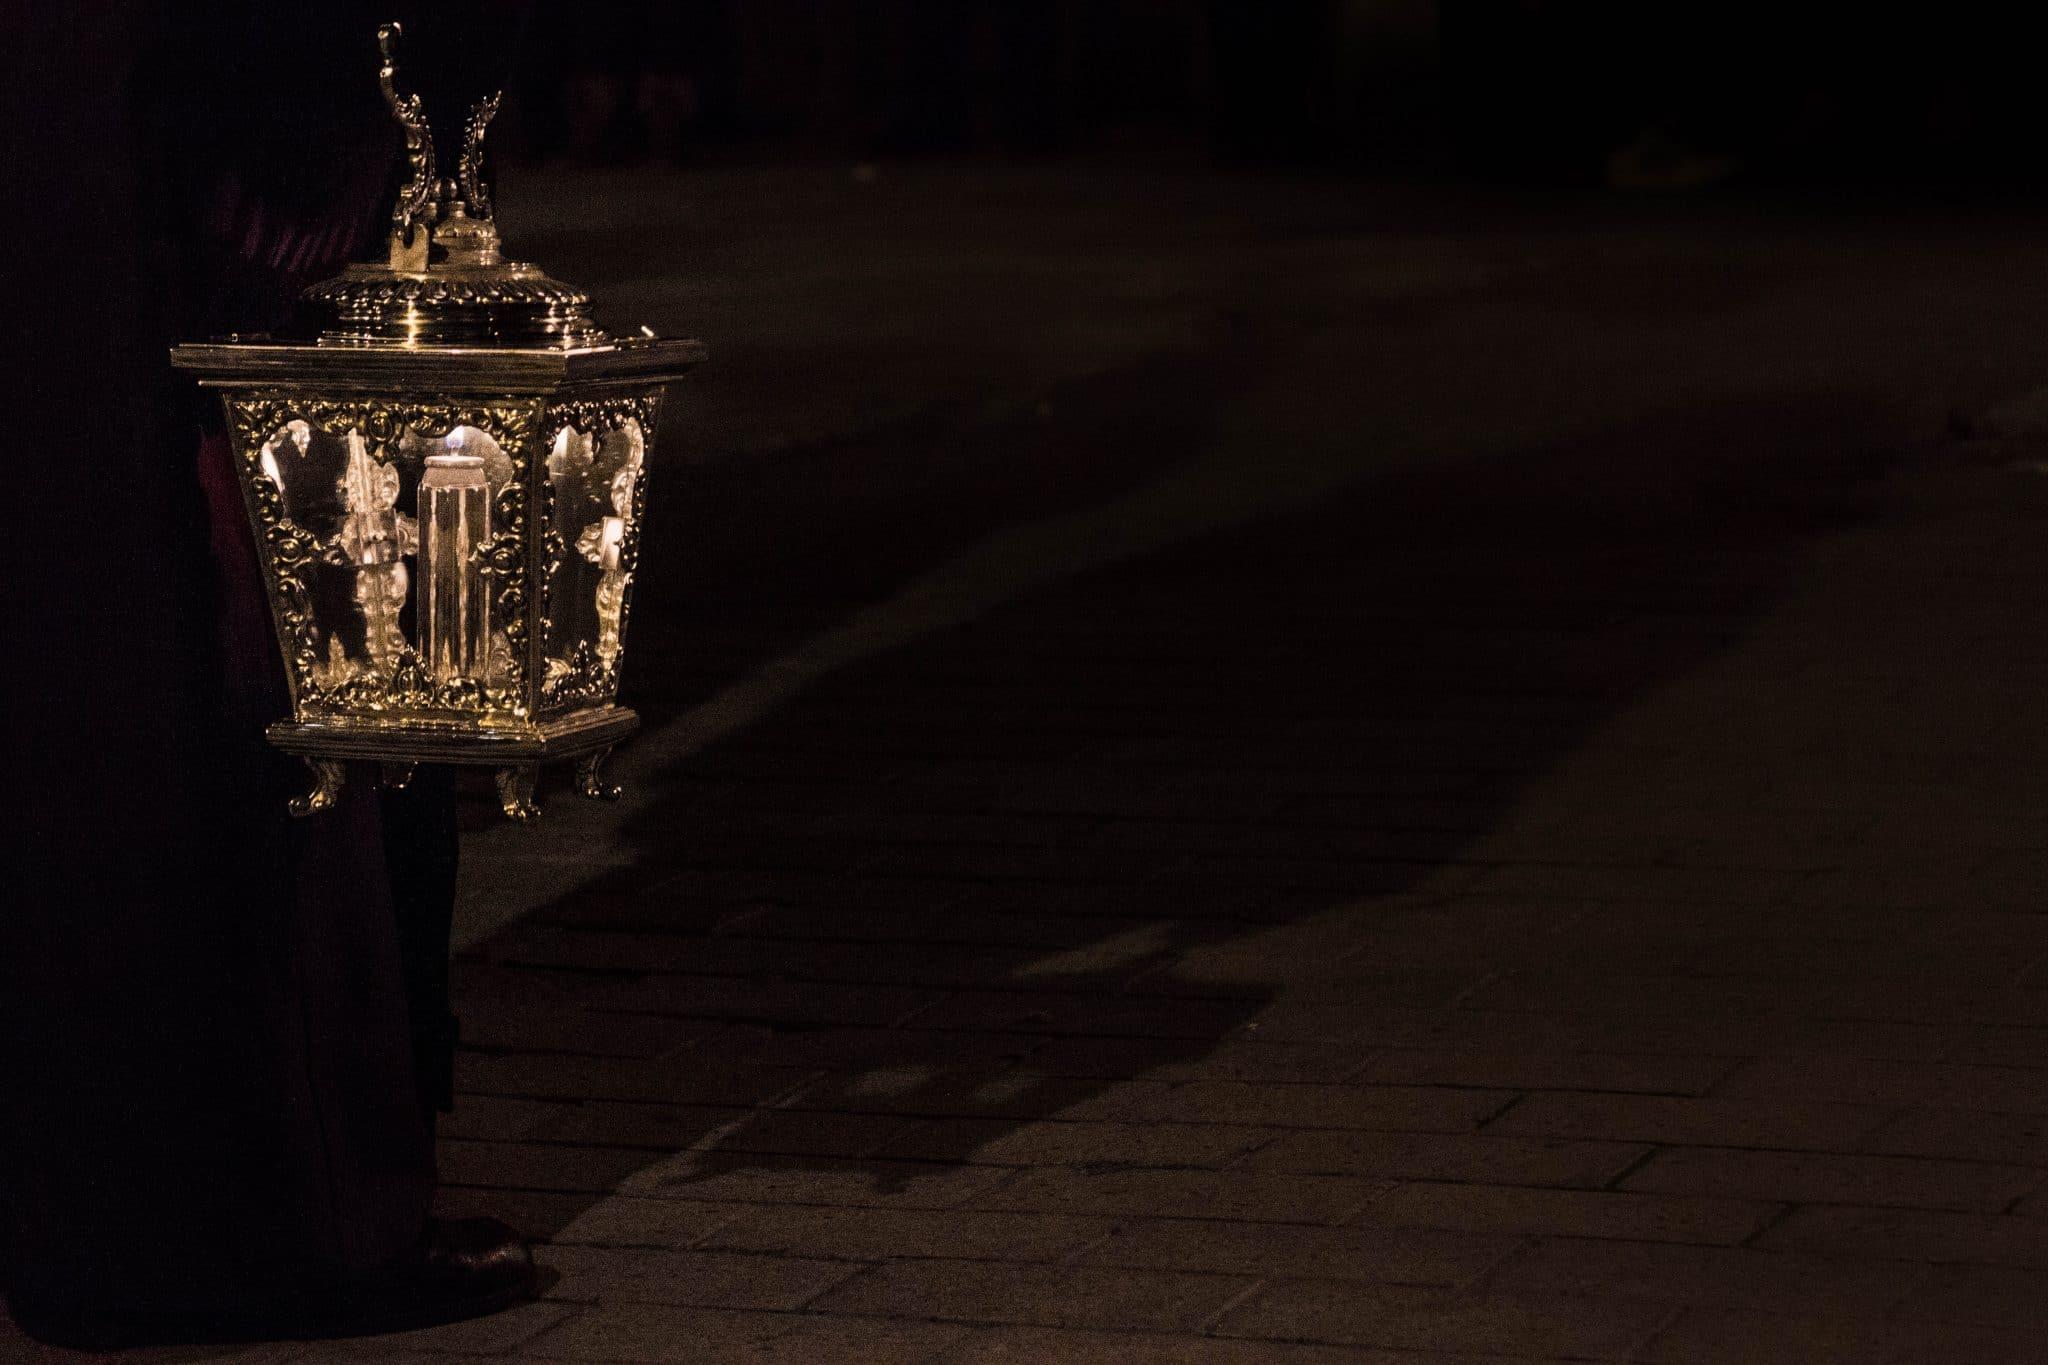 Semana Santa en Zaragoza - Procesion del Nazareno